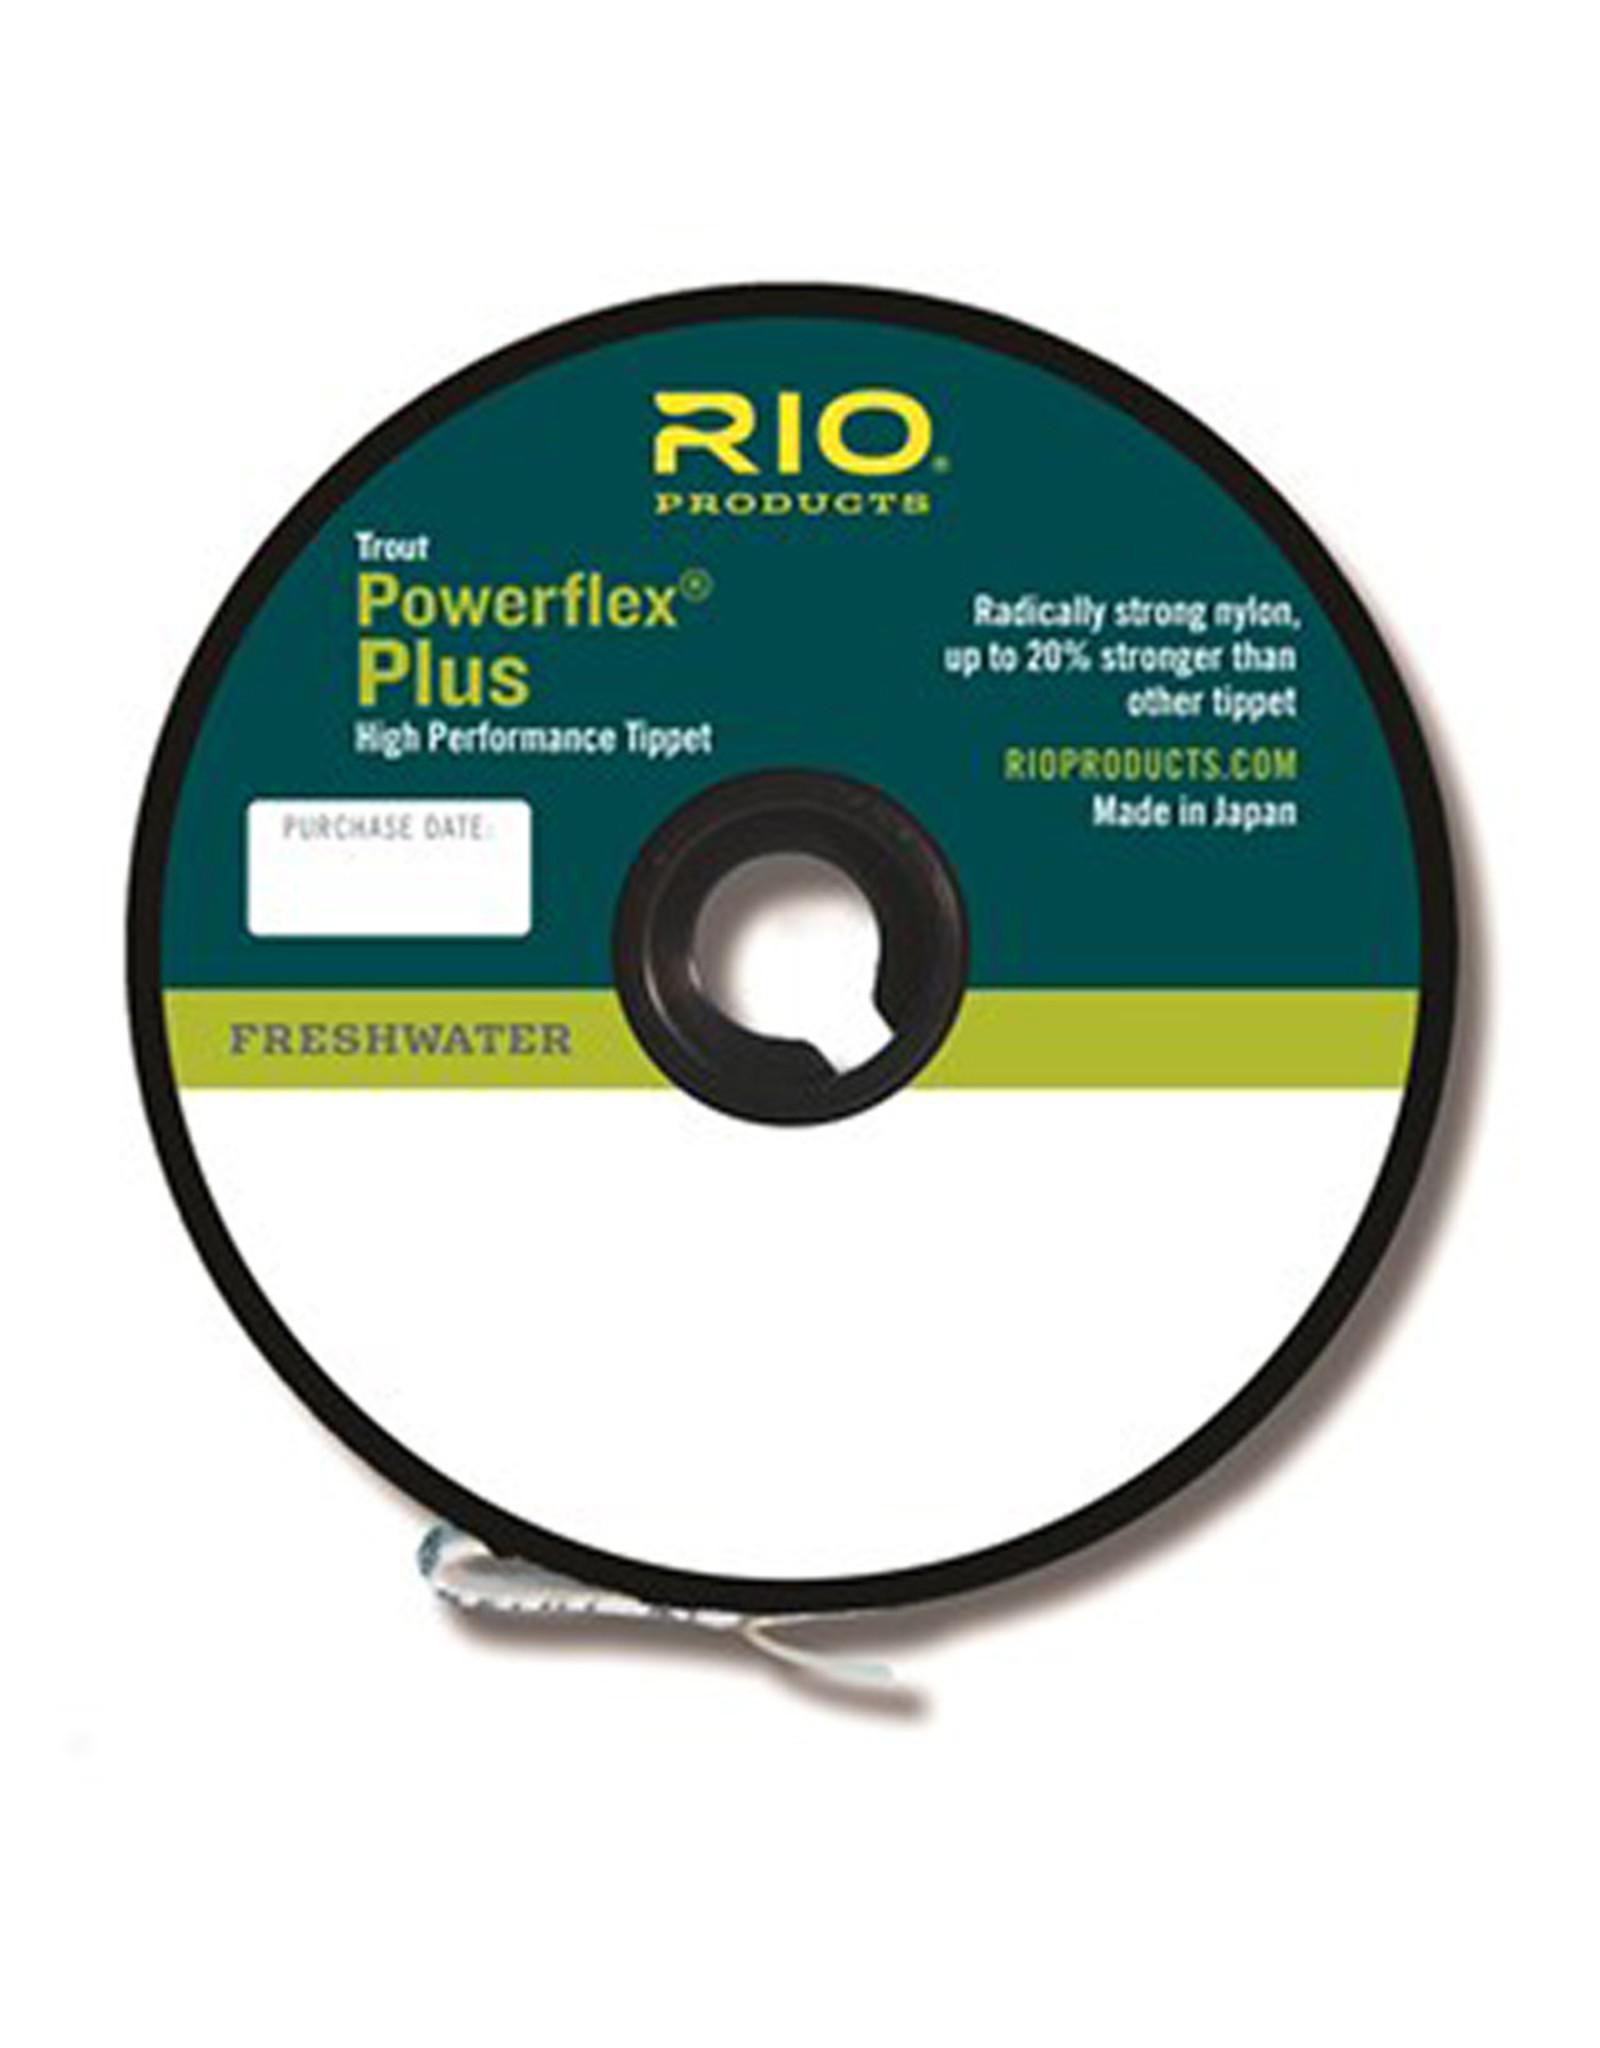 RIO Products Powerflex Plus Tippet